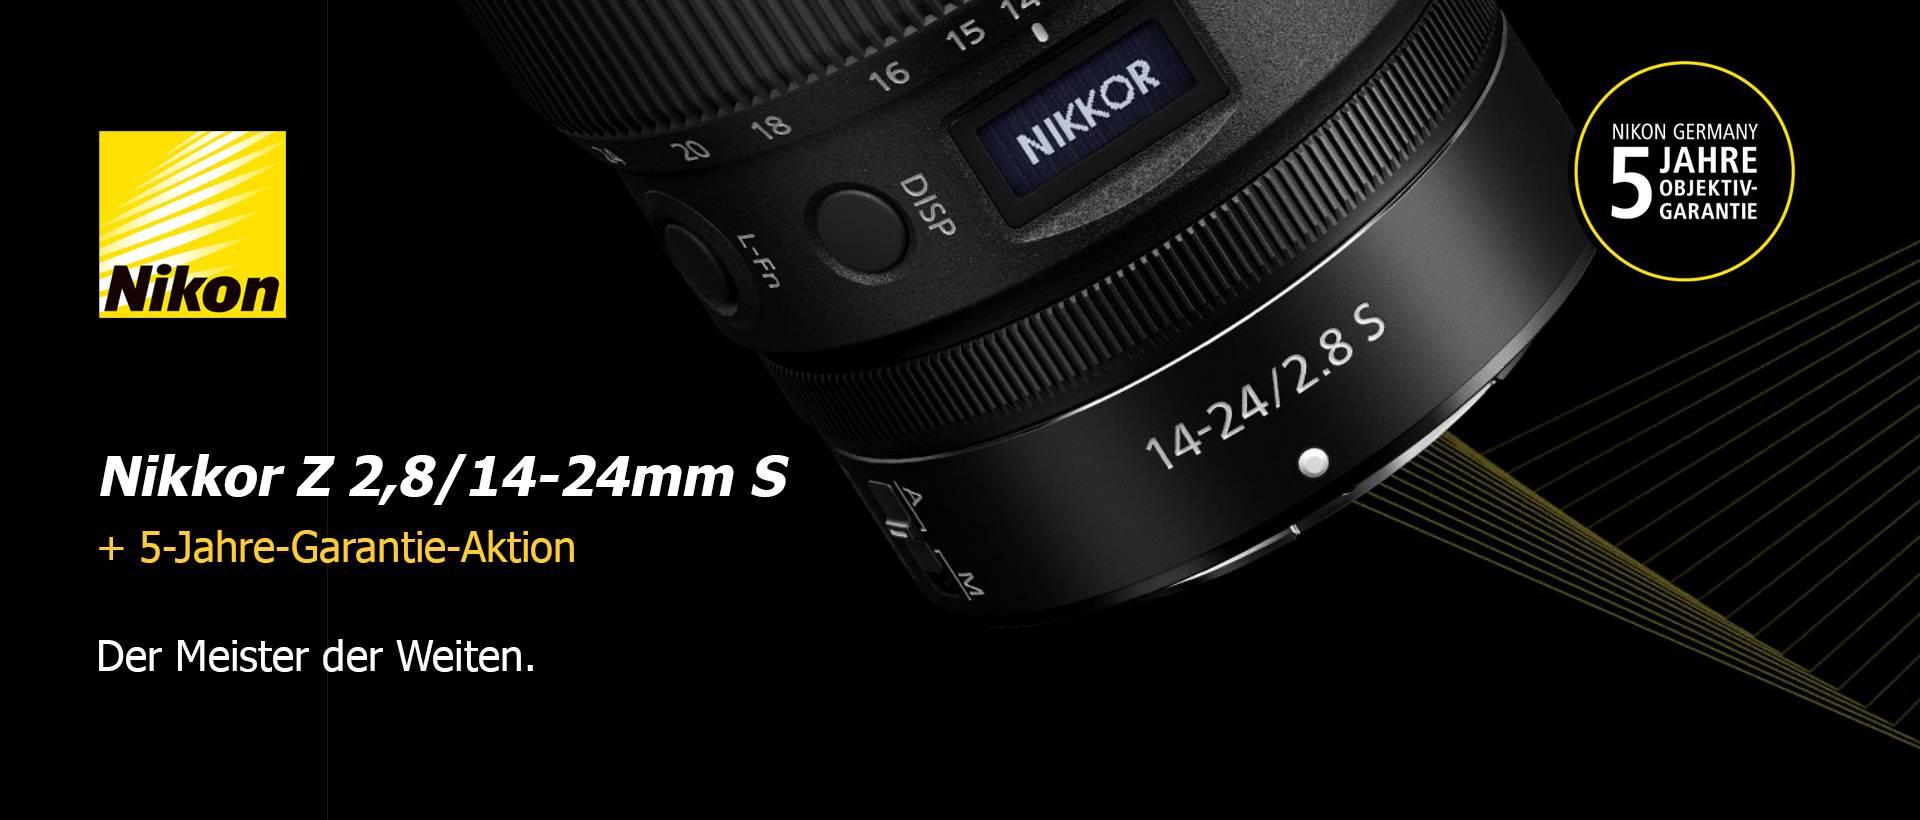 Nikon Z 2,8/14-24mm S + 5-Jahre-Garantie-Aktion